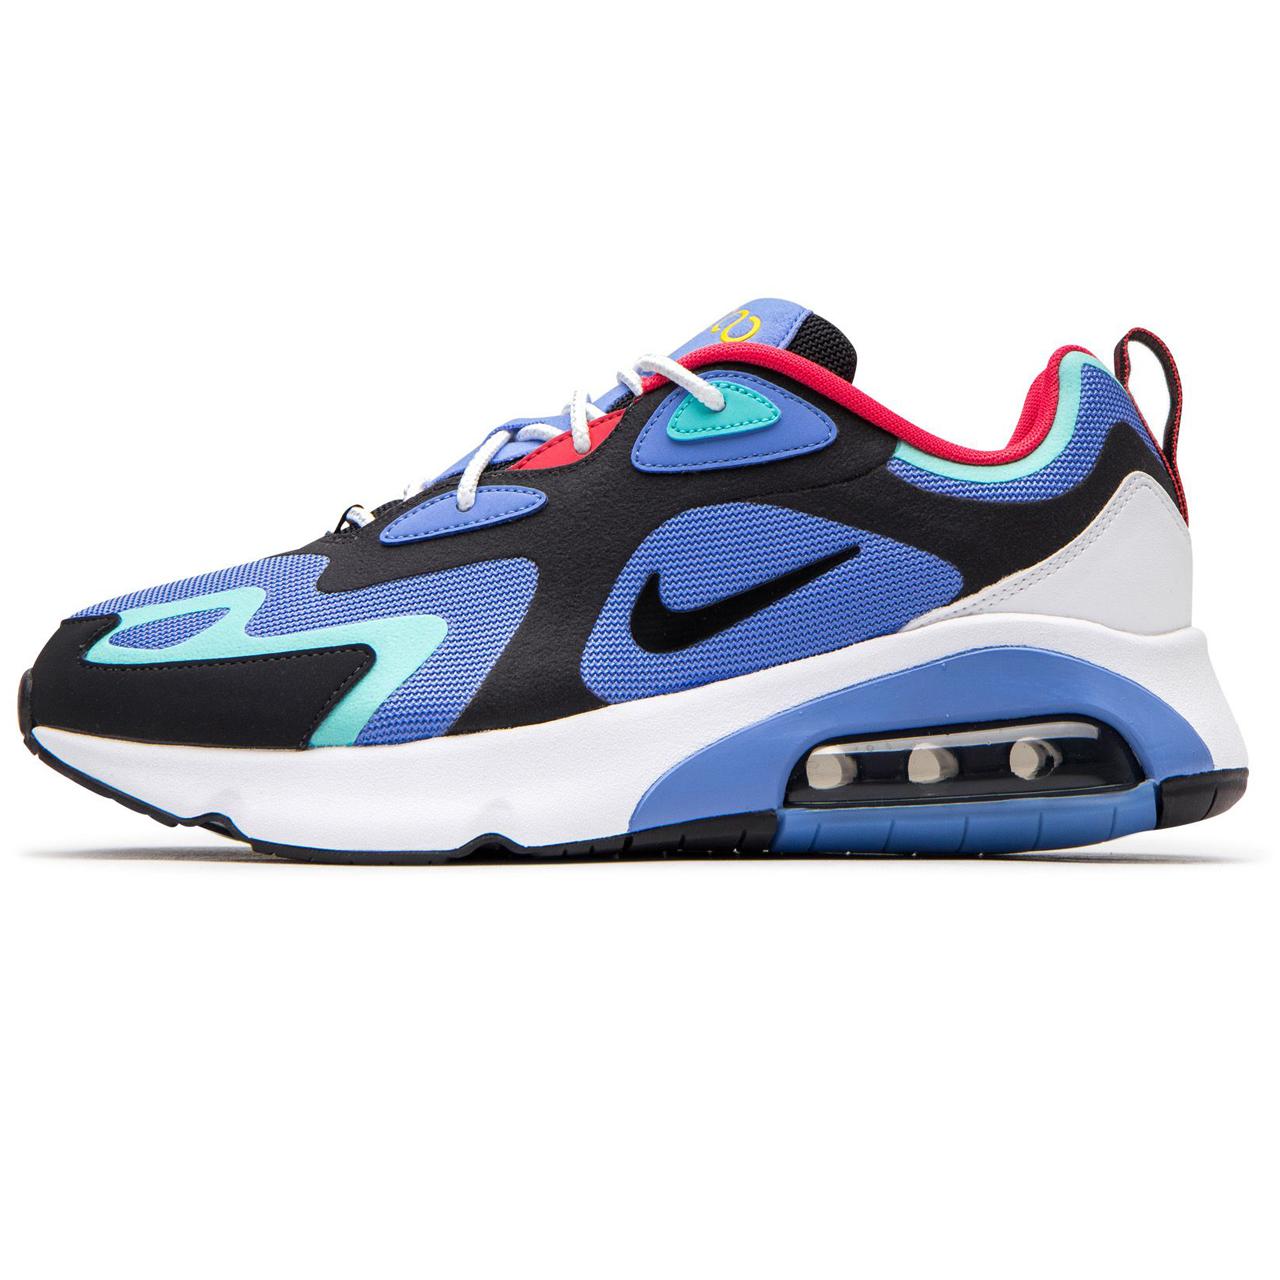 کفش مخصوص دویدن زنانه نایکی مدل Air max 200 کد 6754-098